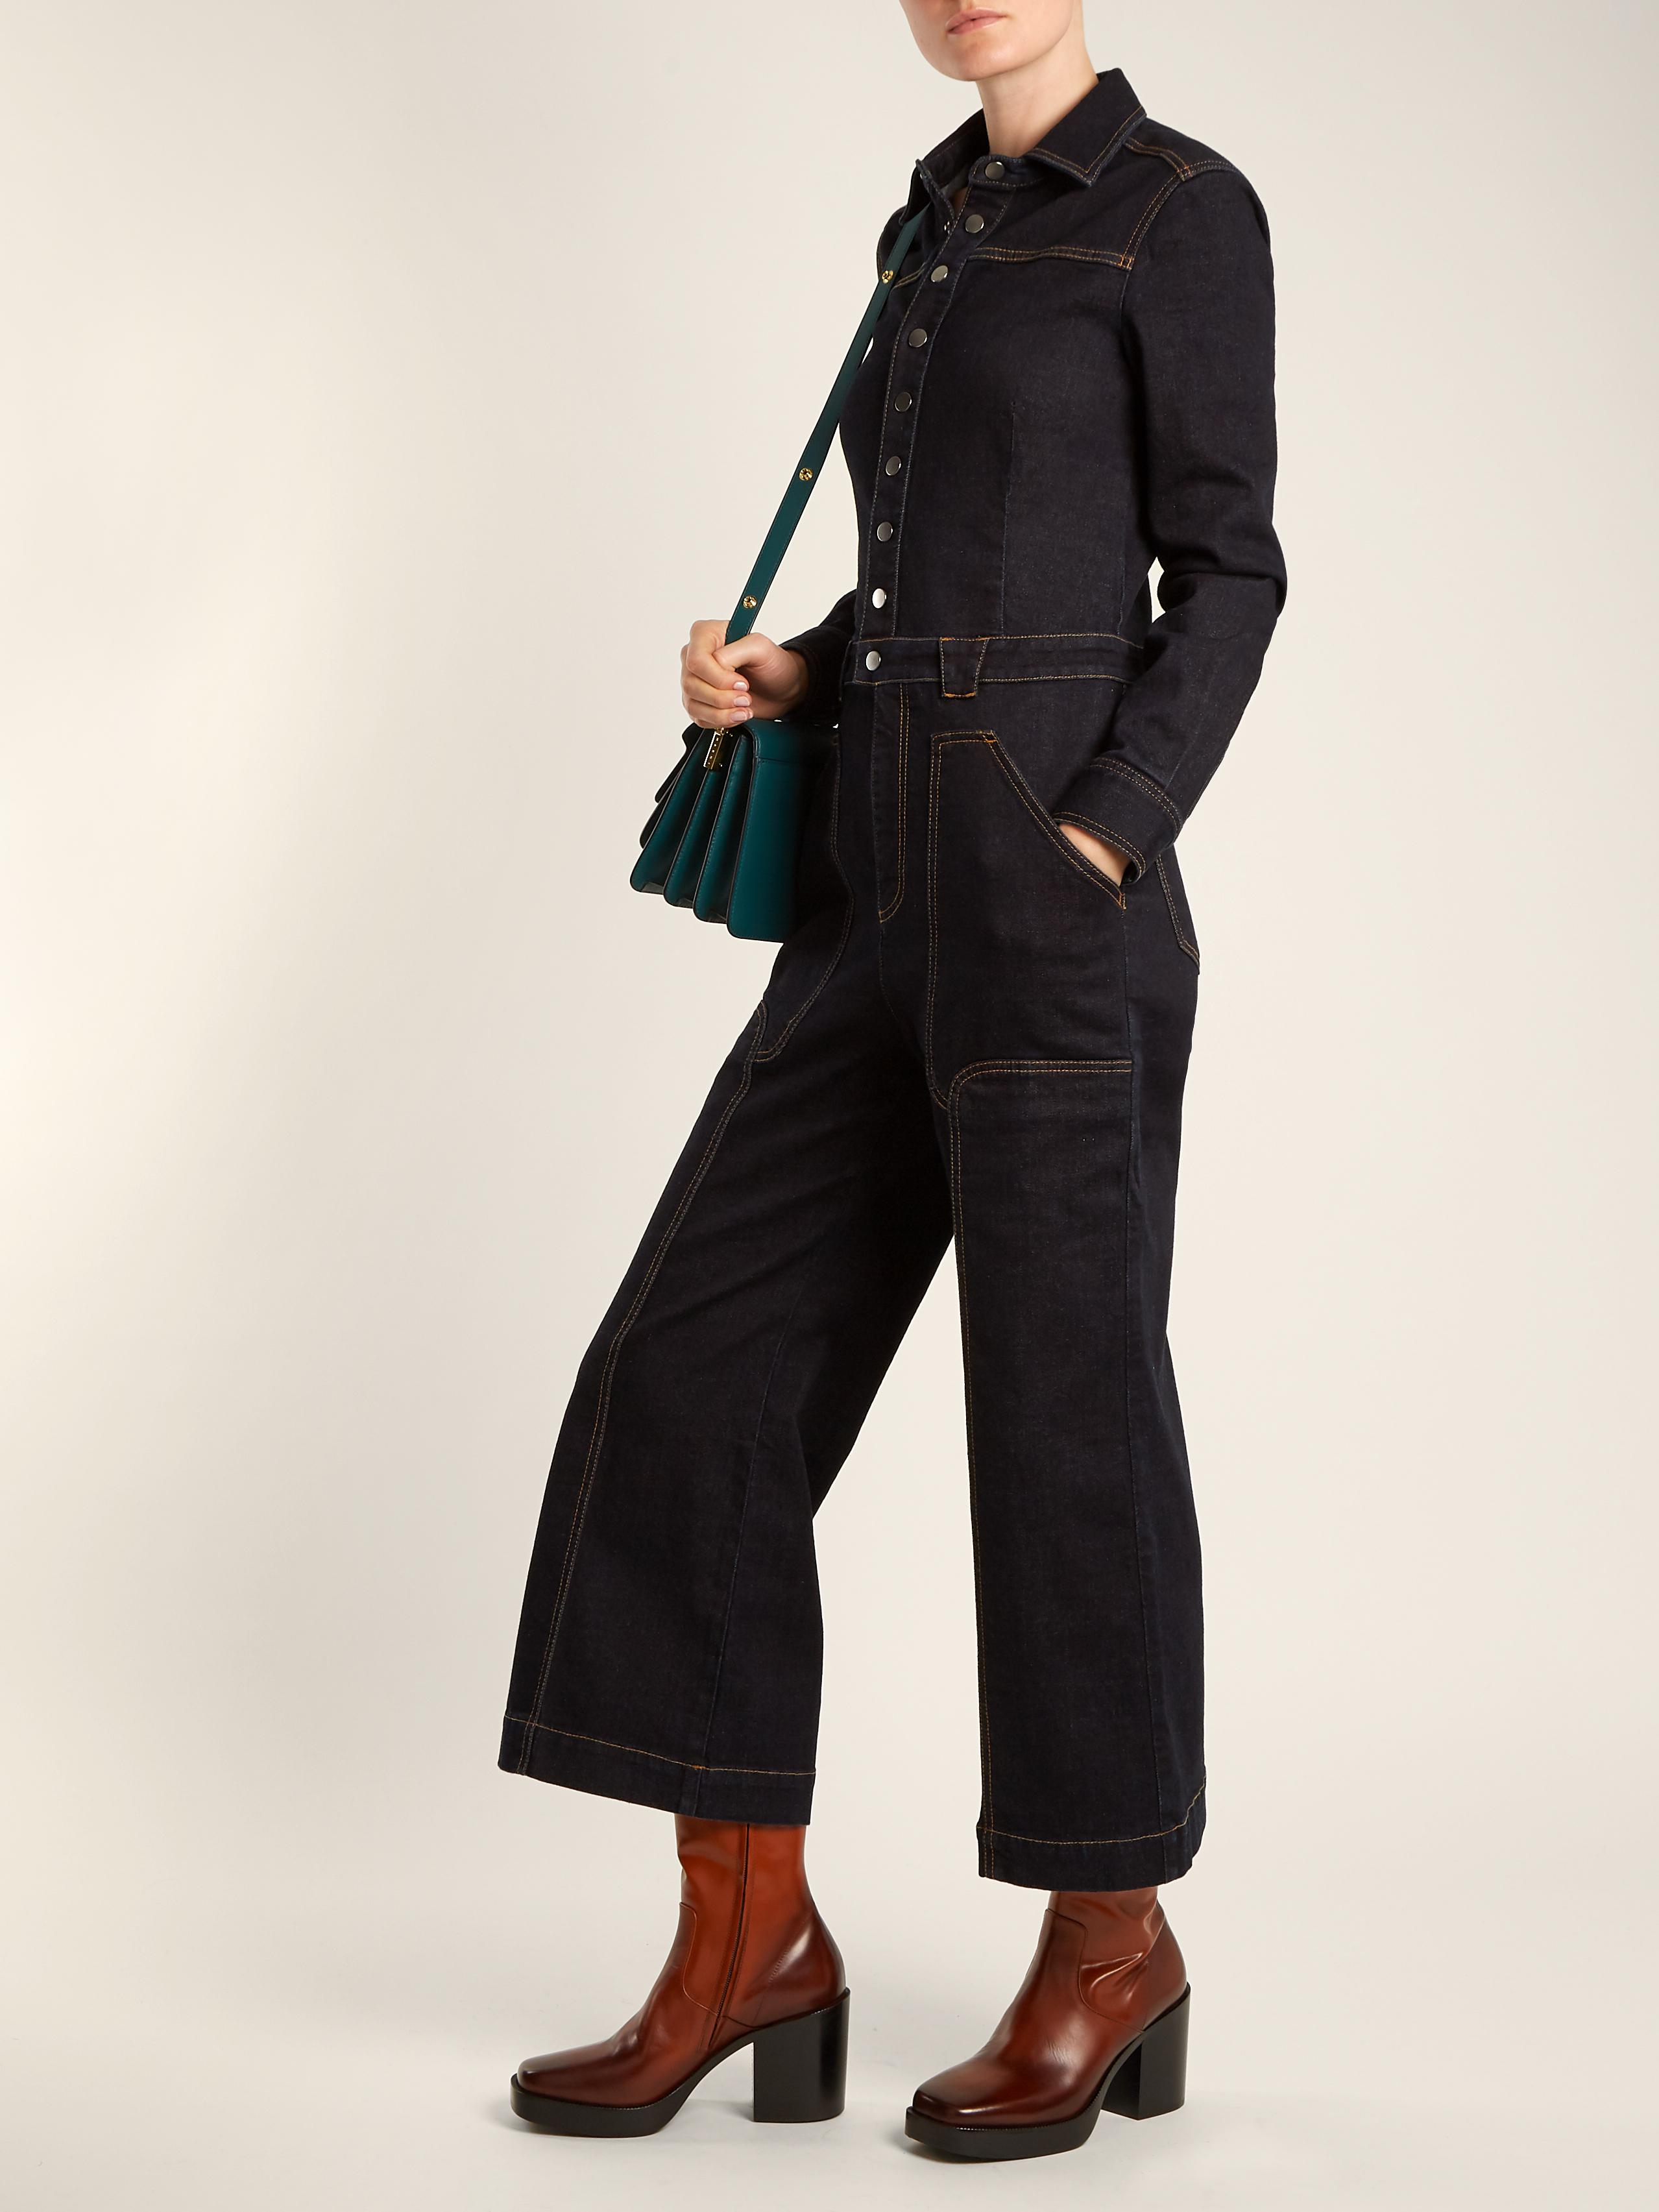 Aio point-collar wide-leg jumpsuit Stella McCartney Get New dIyG6x59Ek